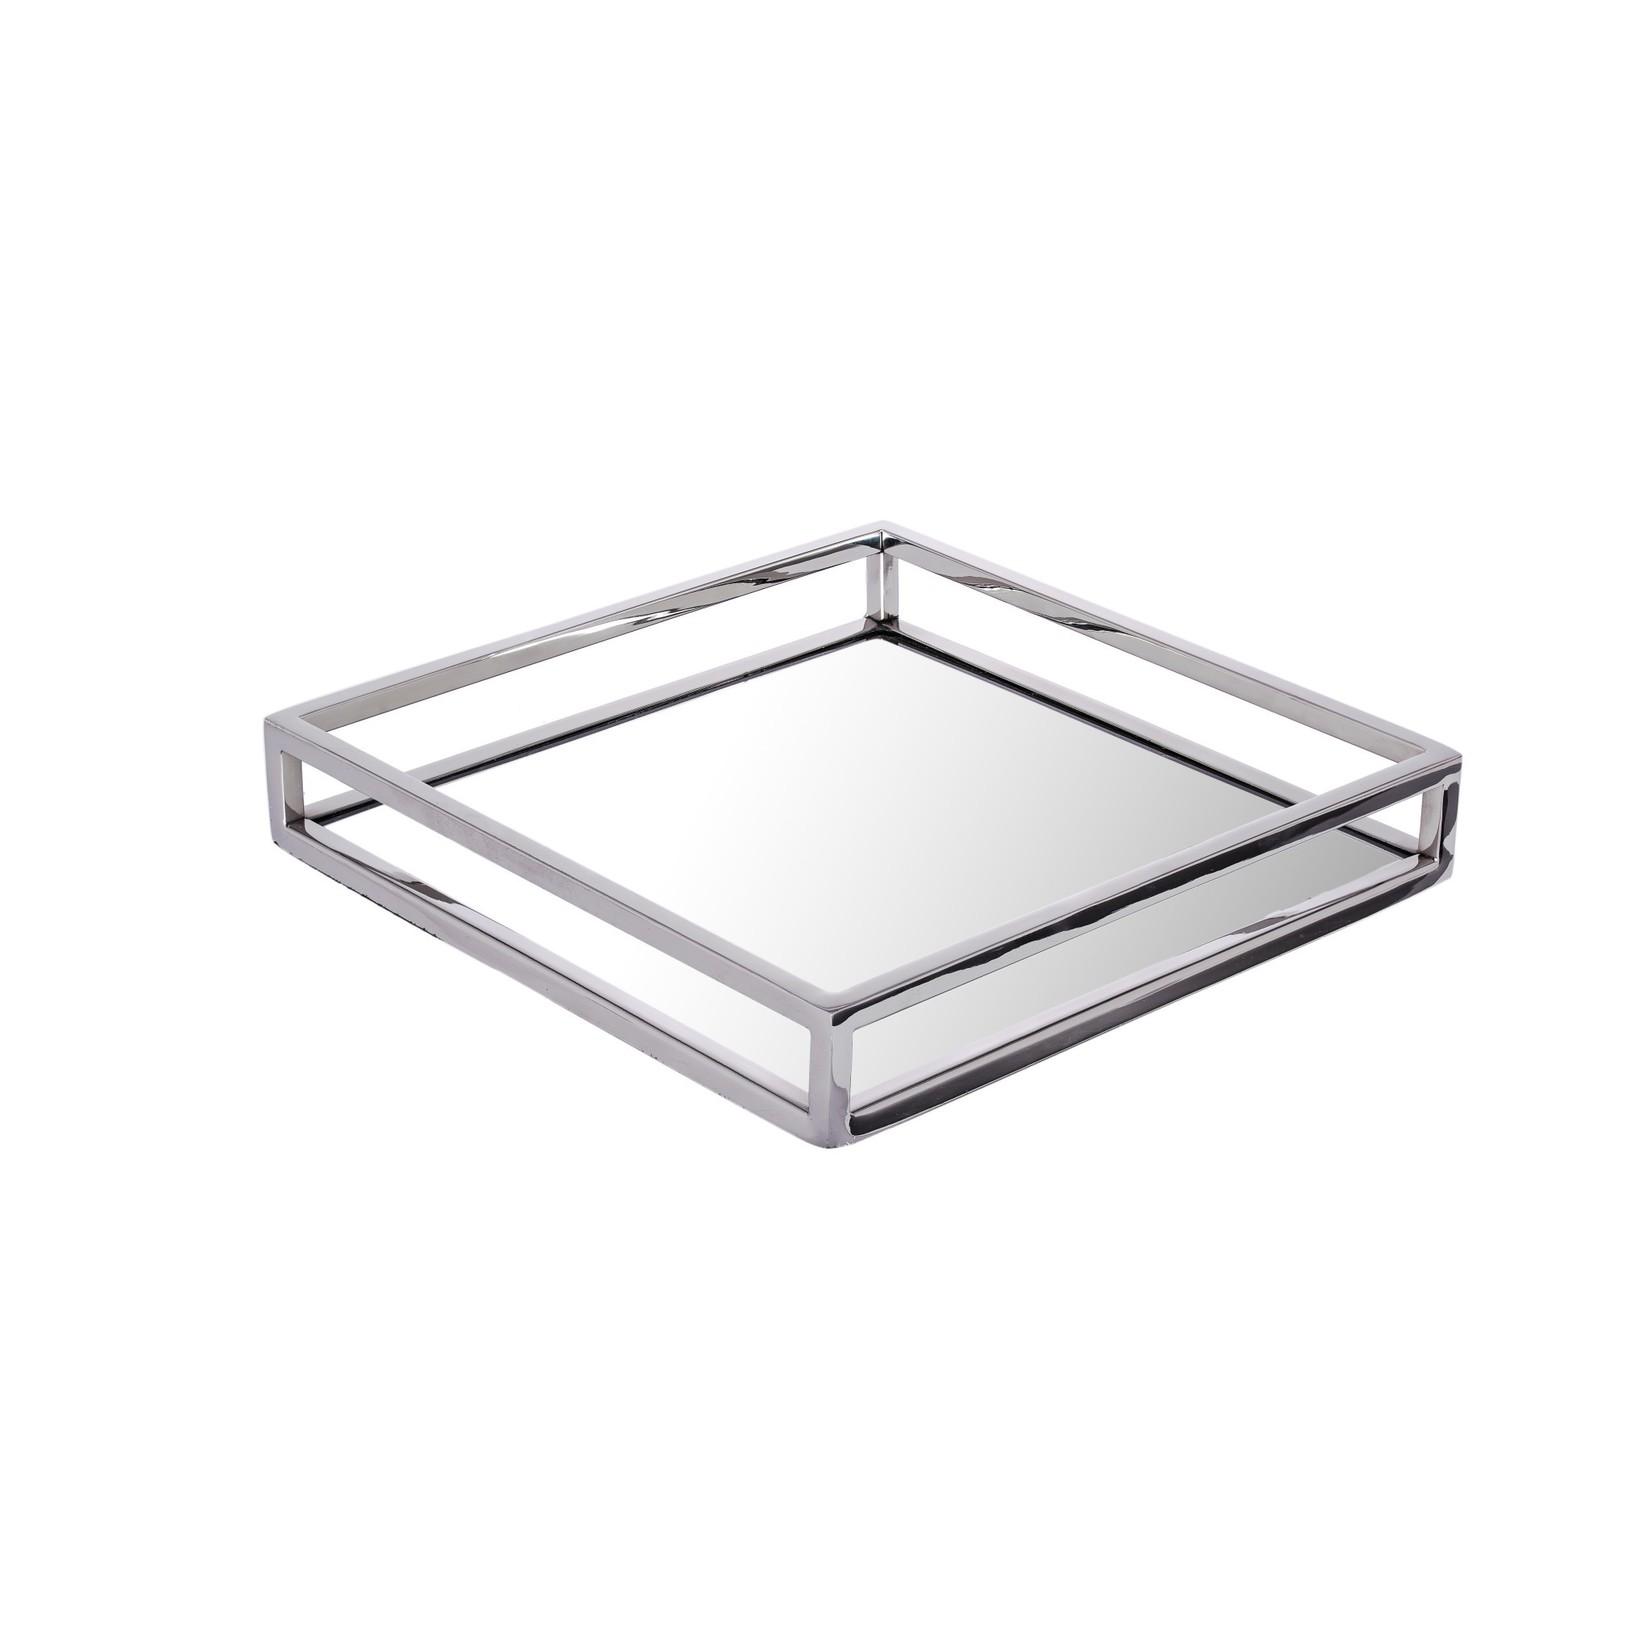 Square Mirrored Napkin Holder